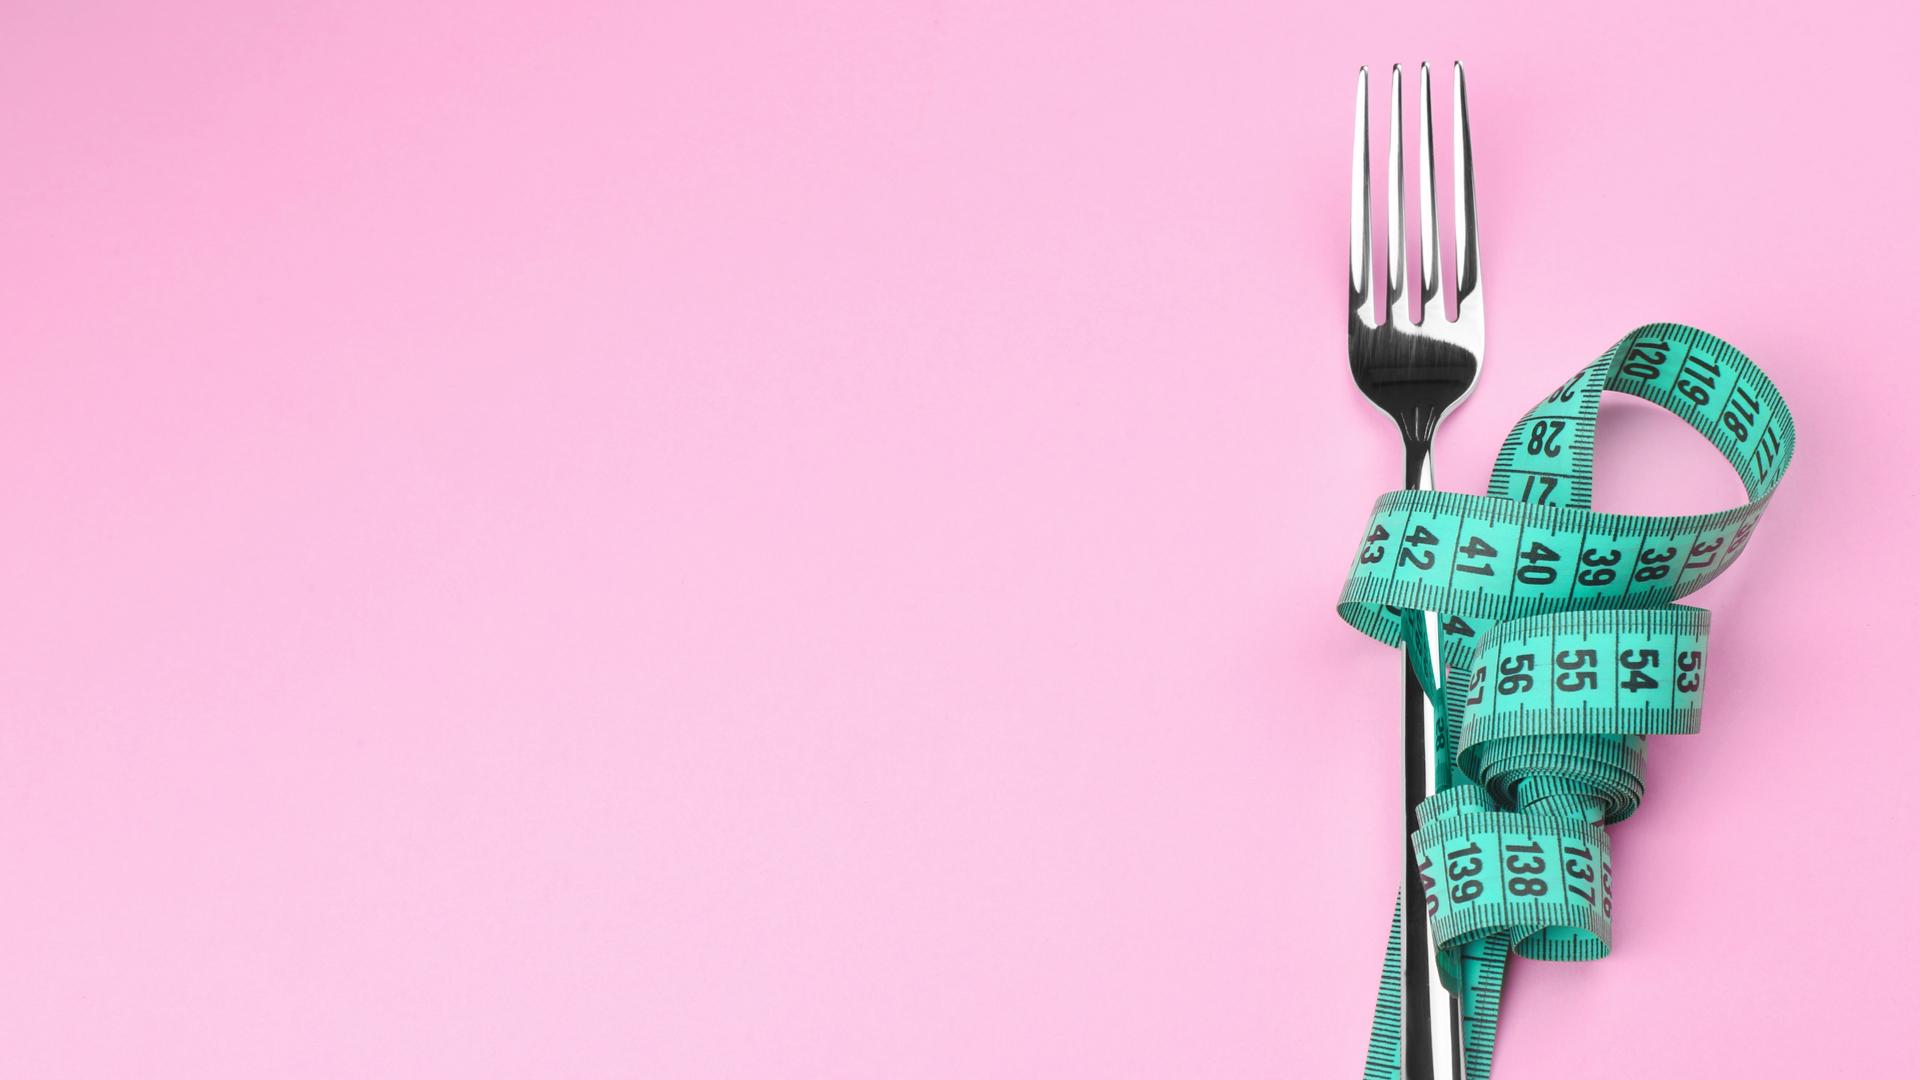 mitos de la dieta alcalina